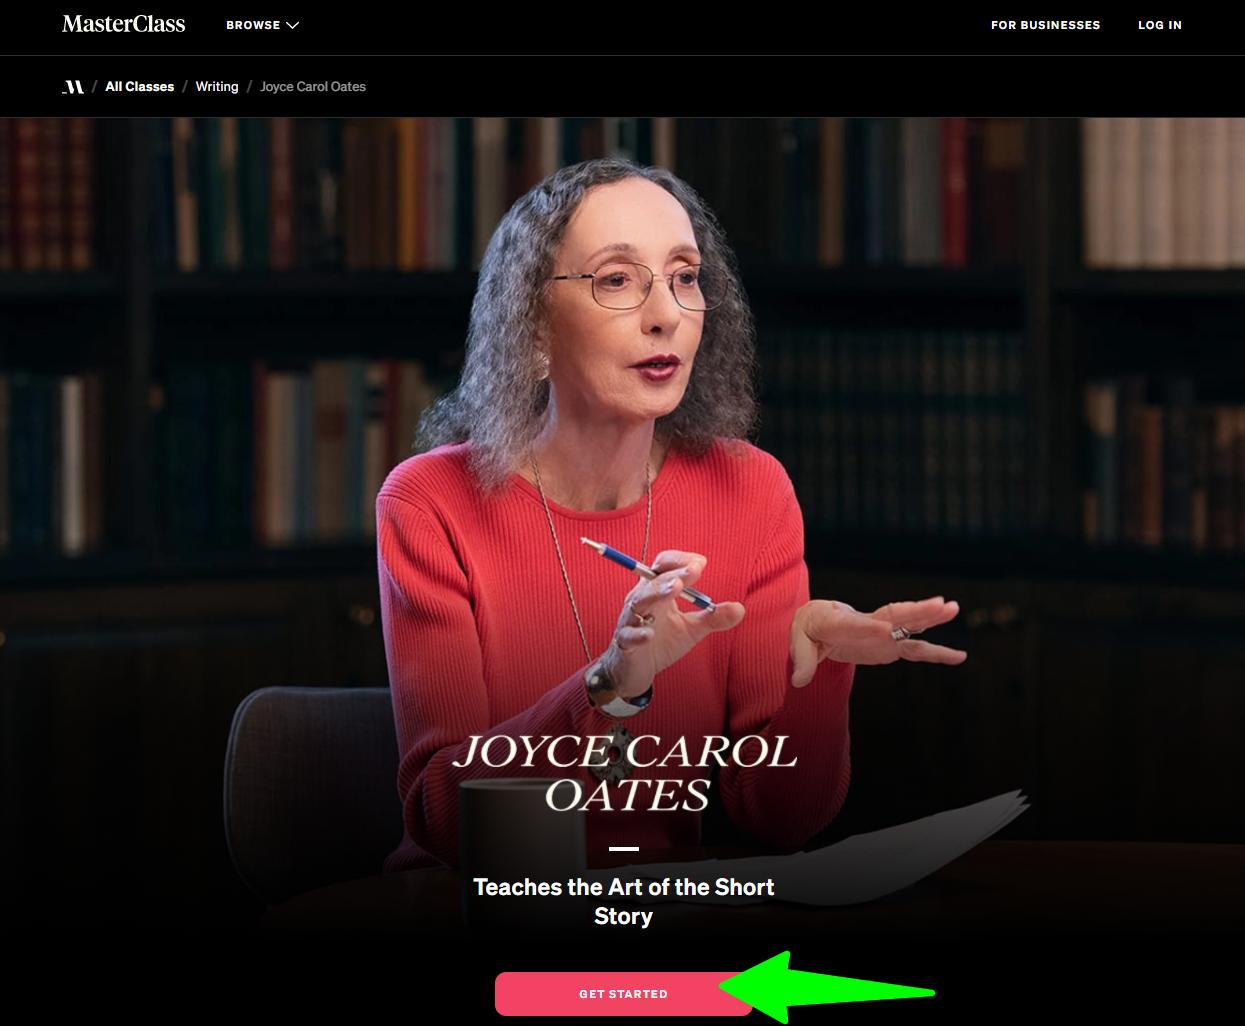 MasterClass-Joyce-Carol-Oates-Teach